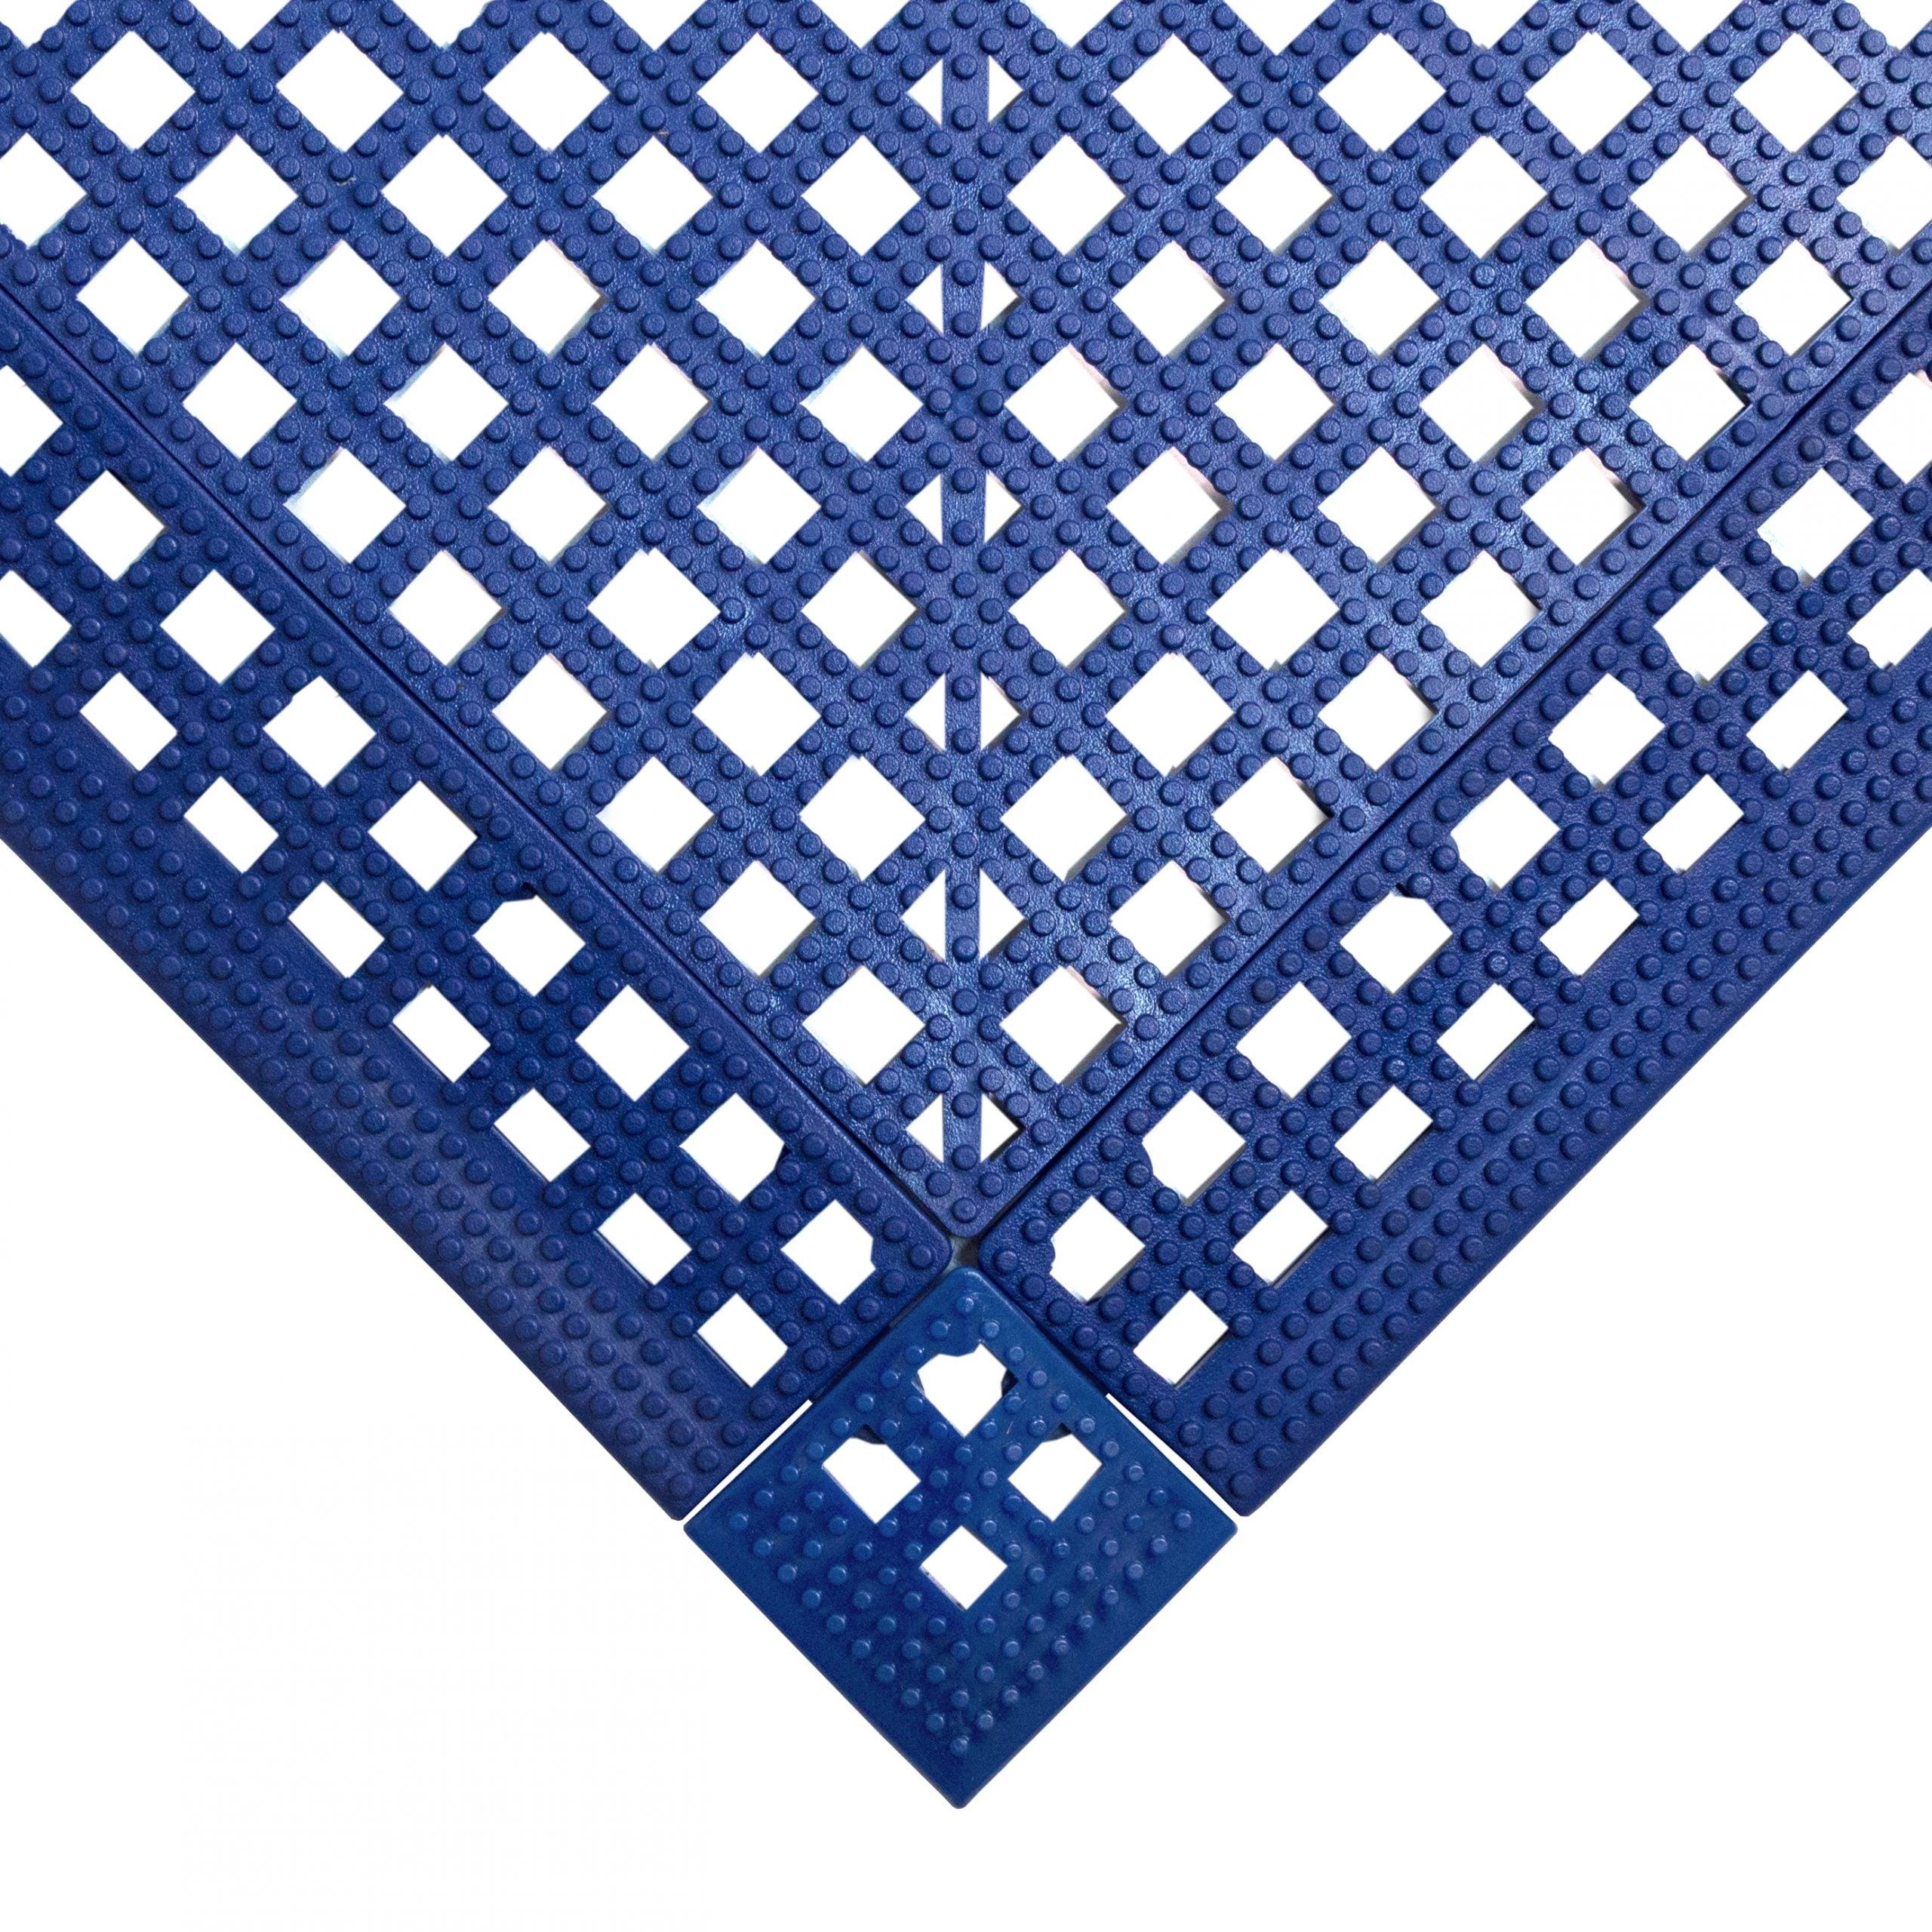 Flexi Deck Leisure Mat Style Blue